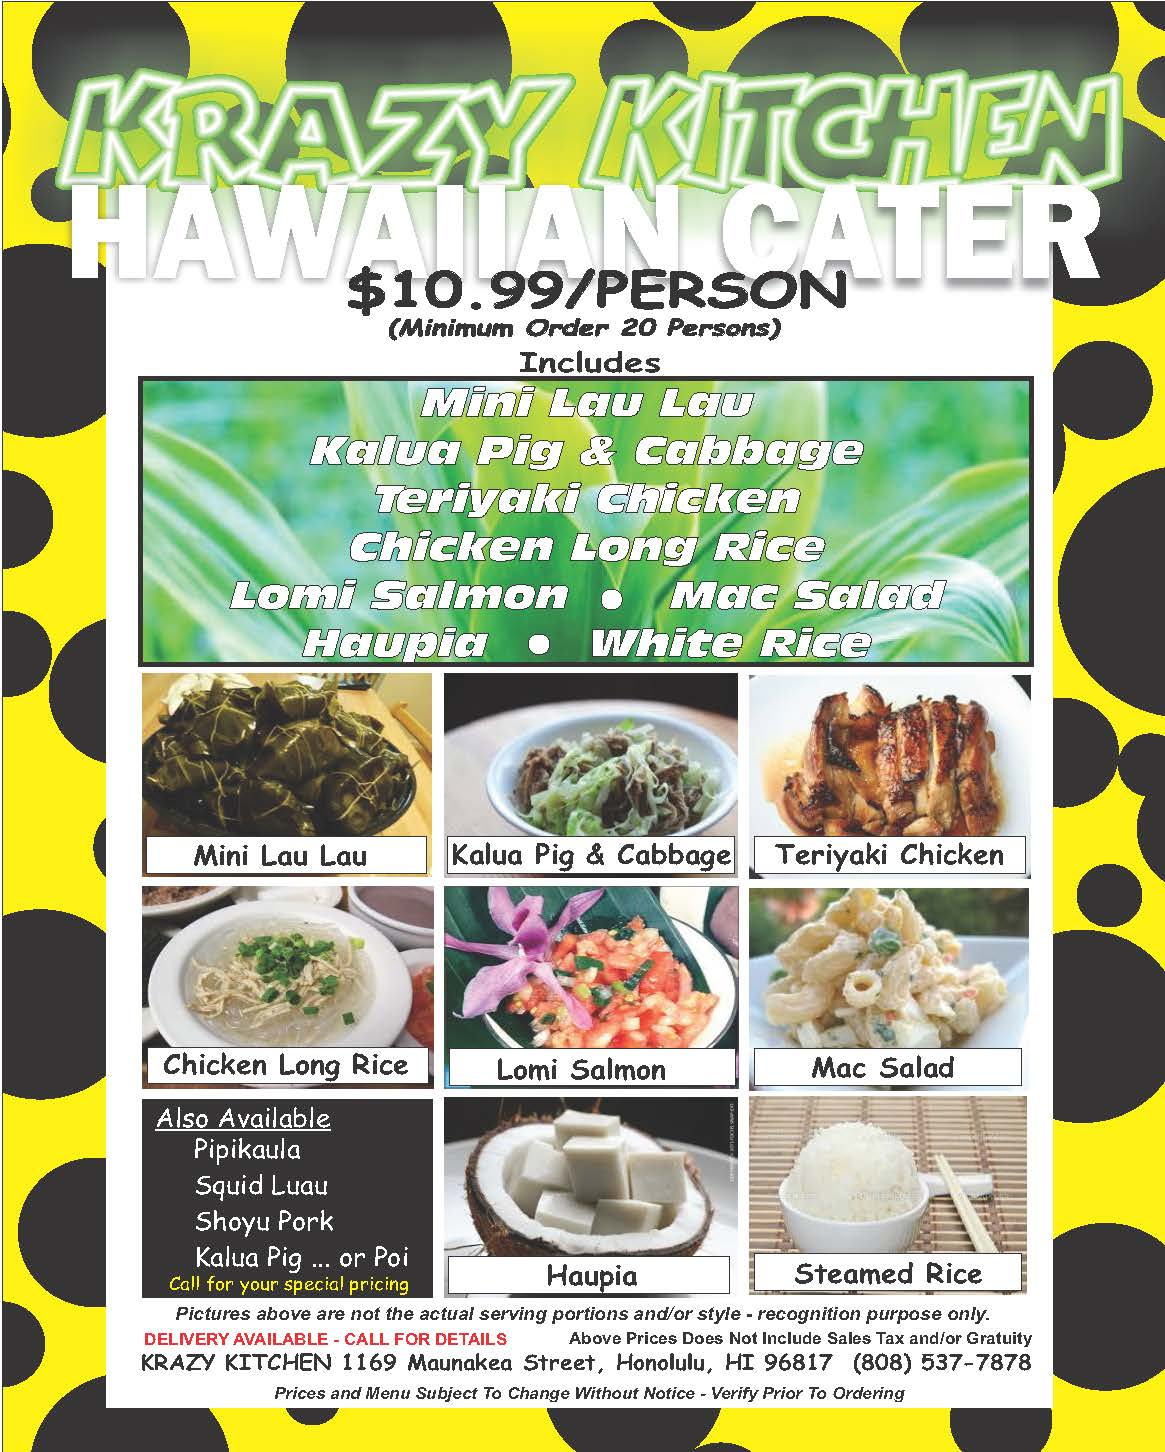 Krazy Kitchen menu Hawaiin catering